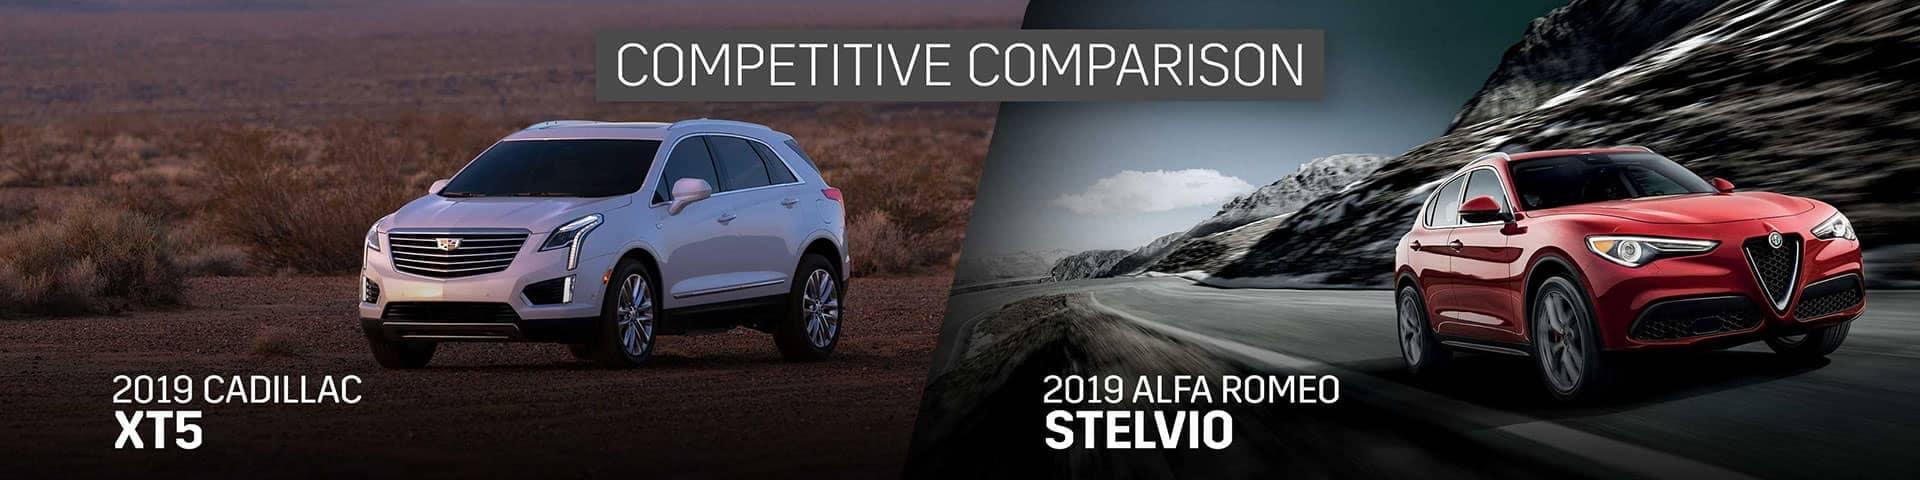 4-compare-2019-Cadillac-xt5-1